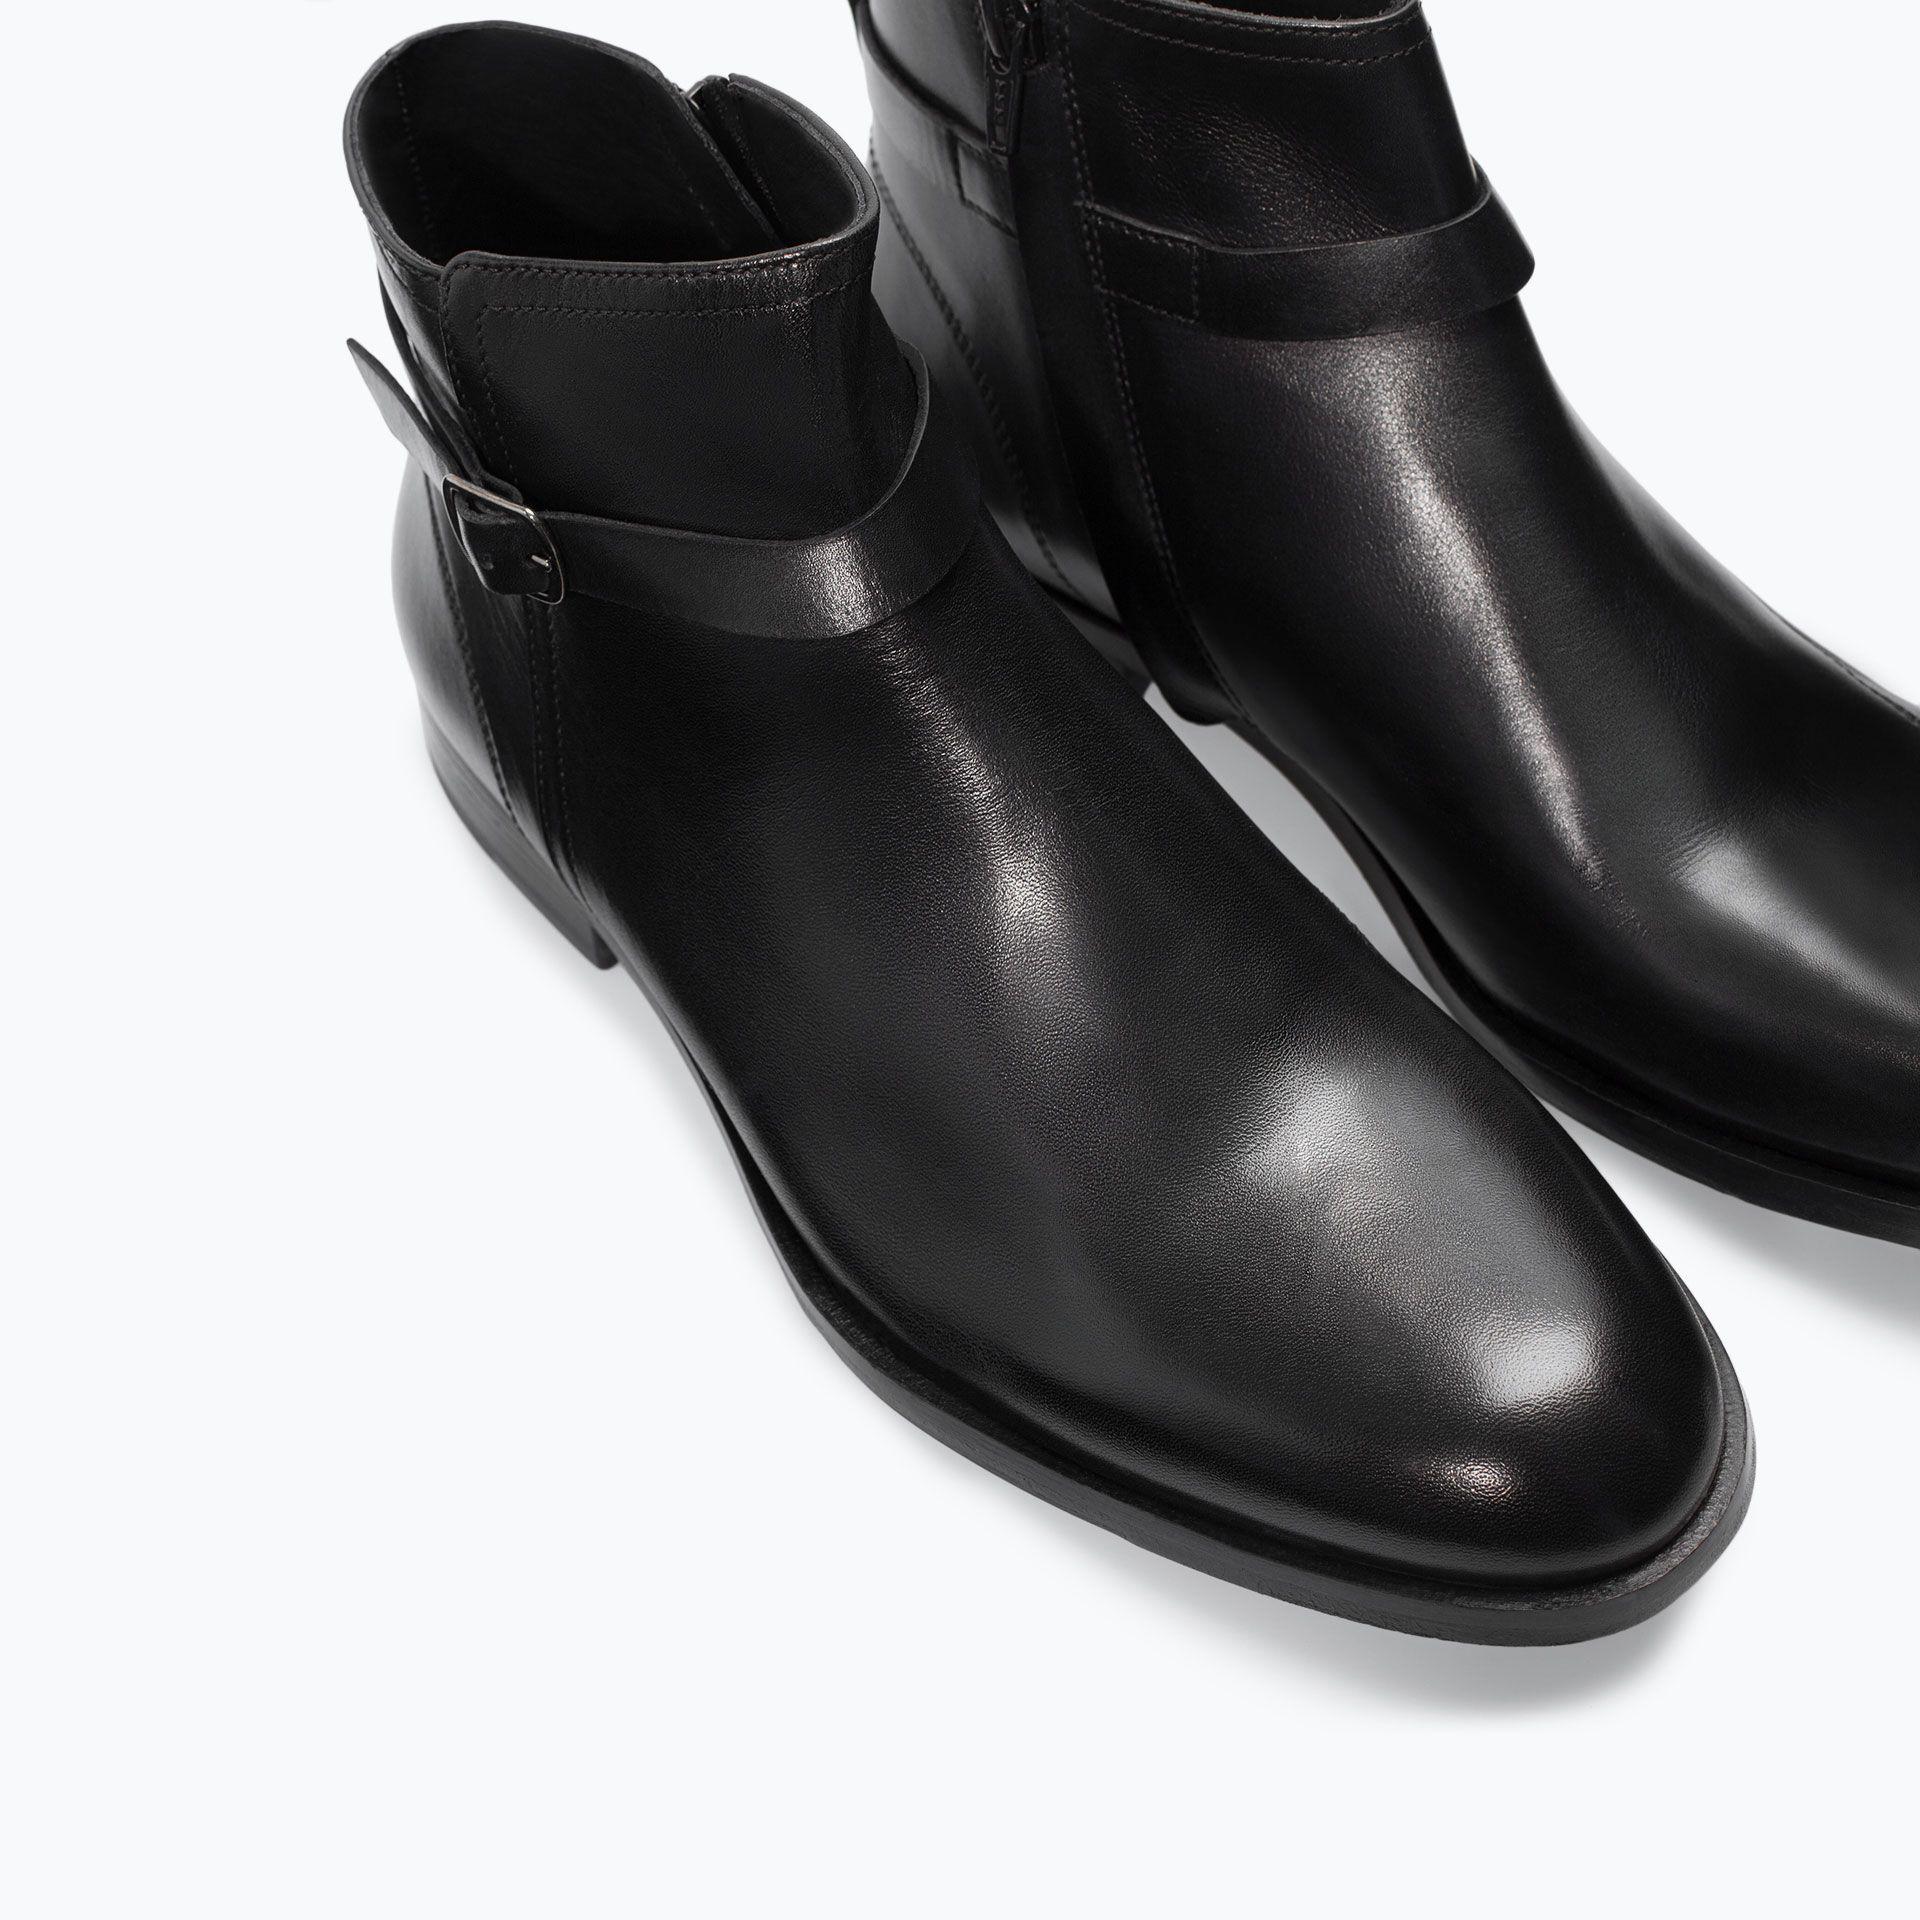 Leather Ankle Boot With Buckle Shoes Man Shoes Bags Zara Jordan 99 00 Jod Boots Dress Shoes Men Mens Shoes Boots